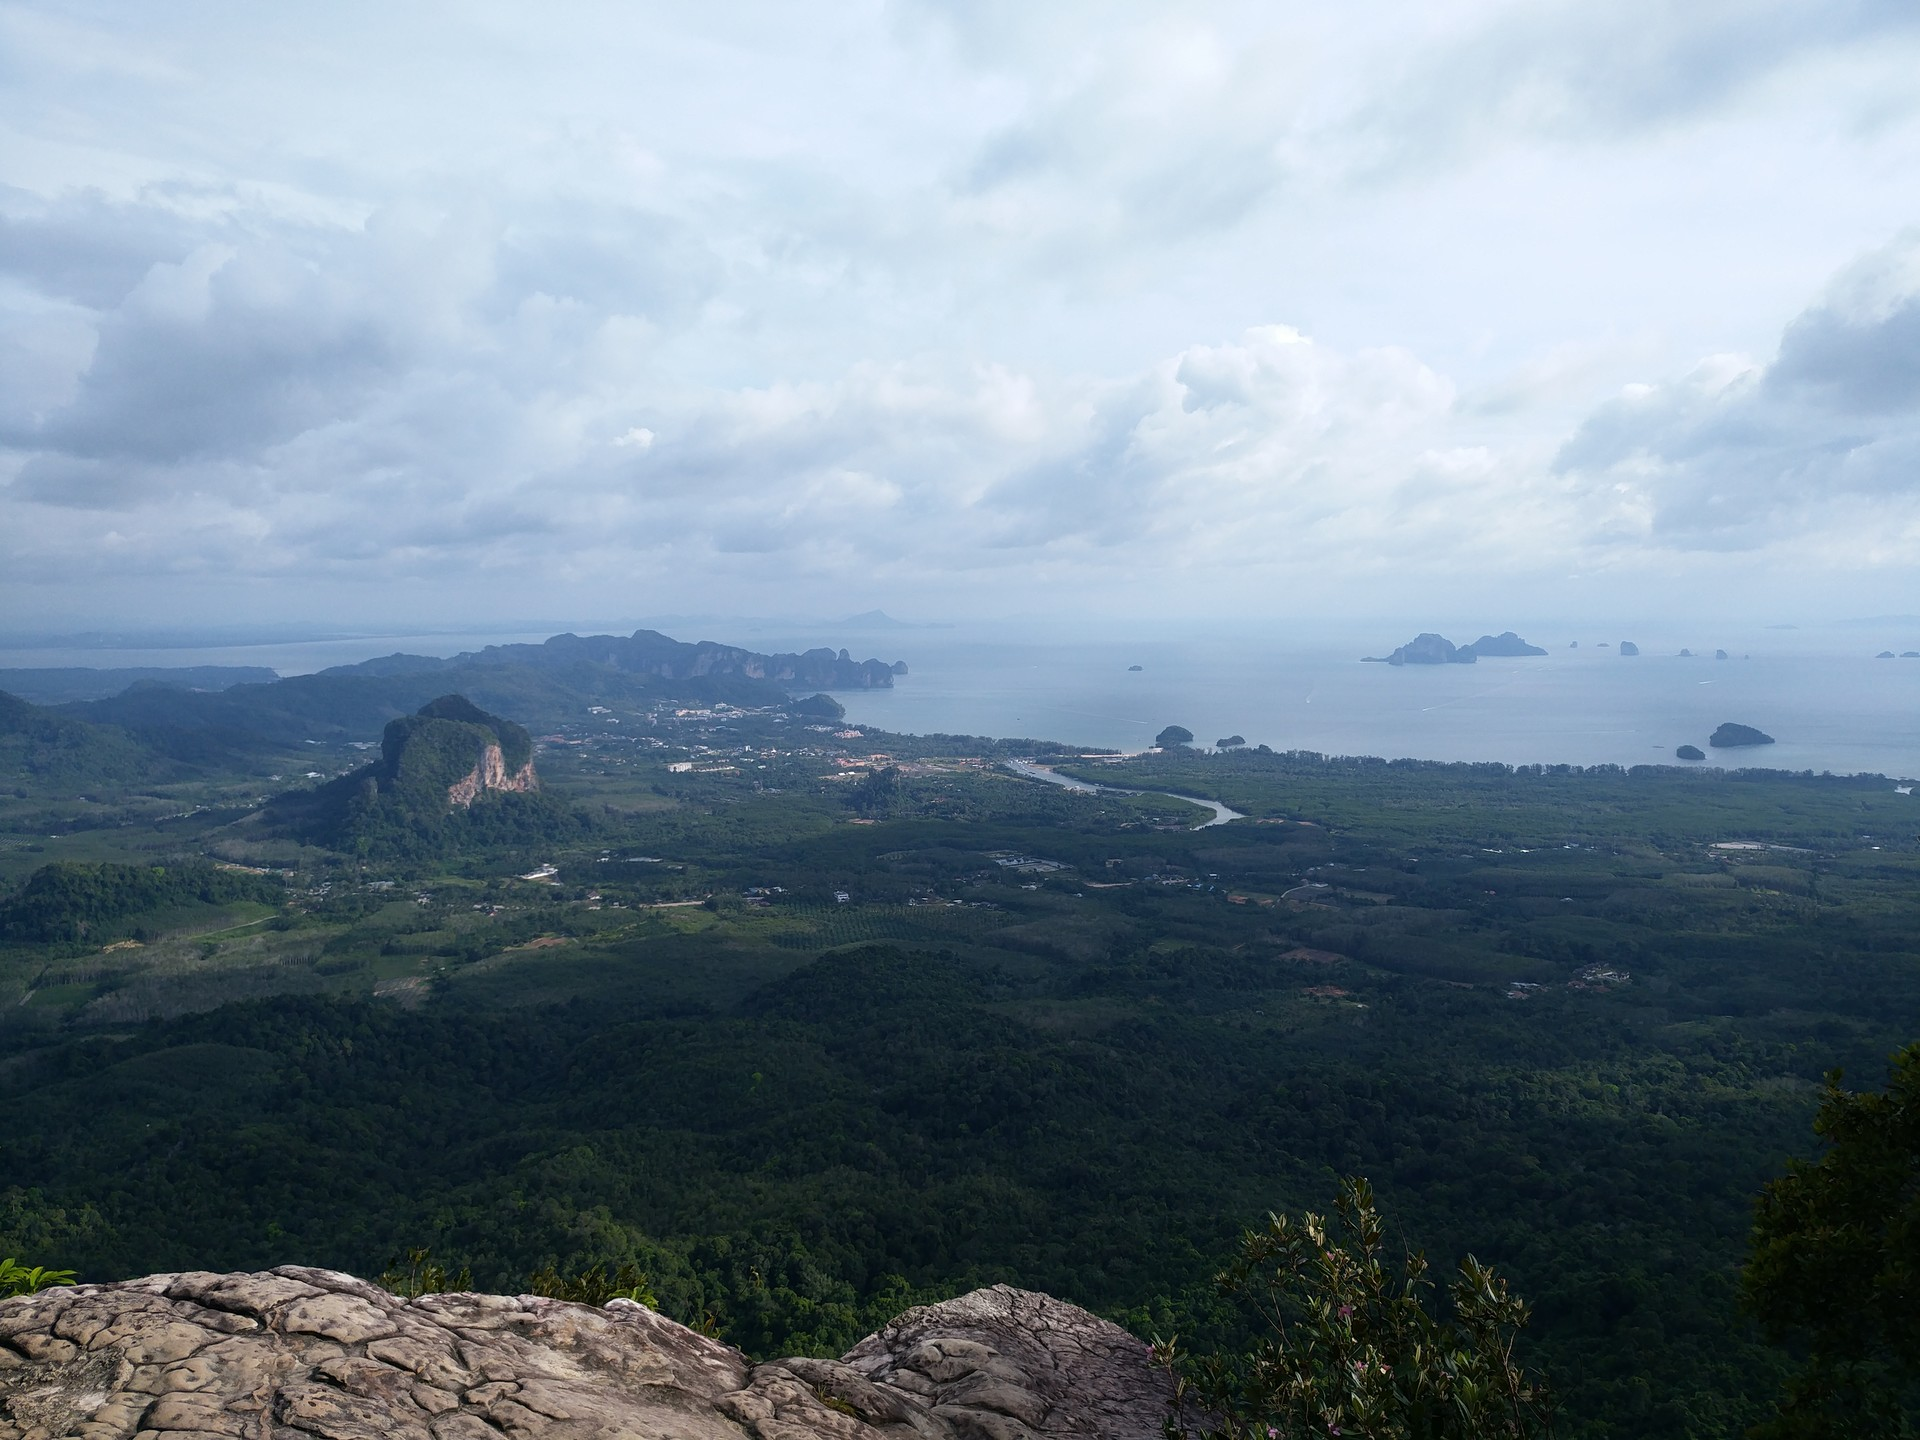 hiking-dragon-crest-mountain-trail-6b592